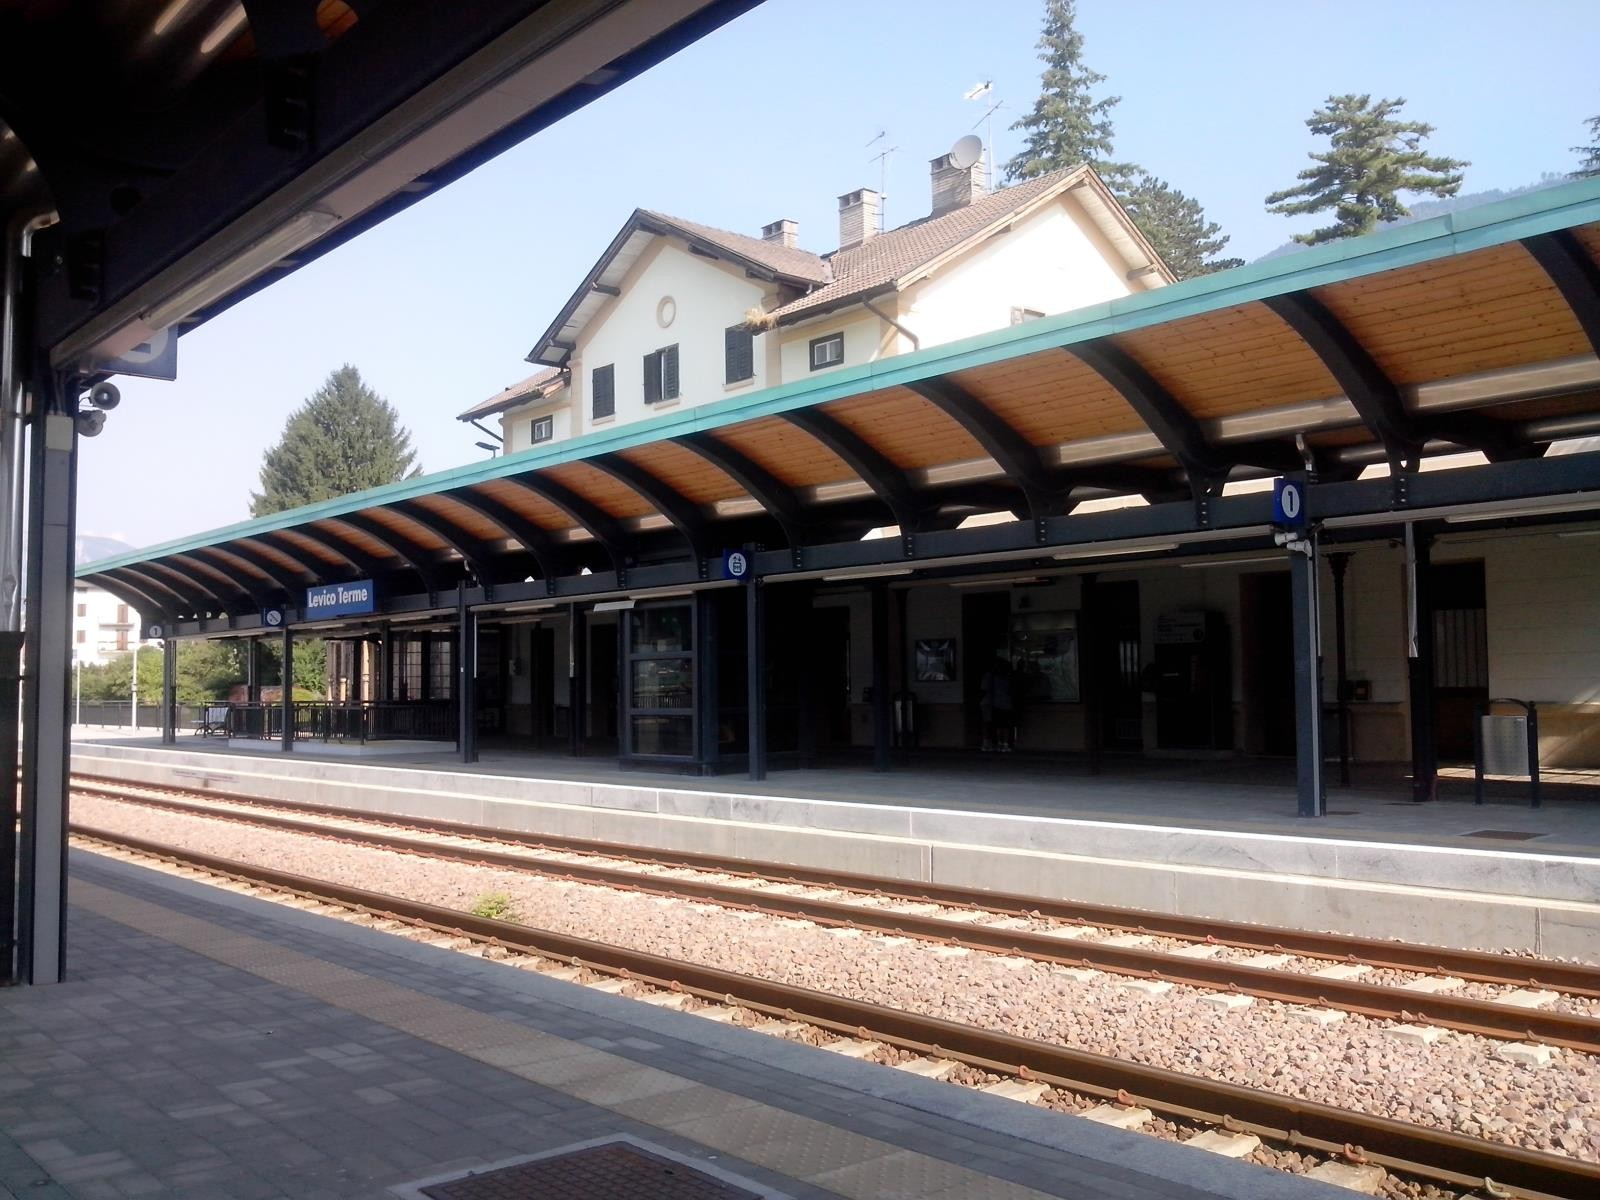 Gare de Levico Terme